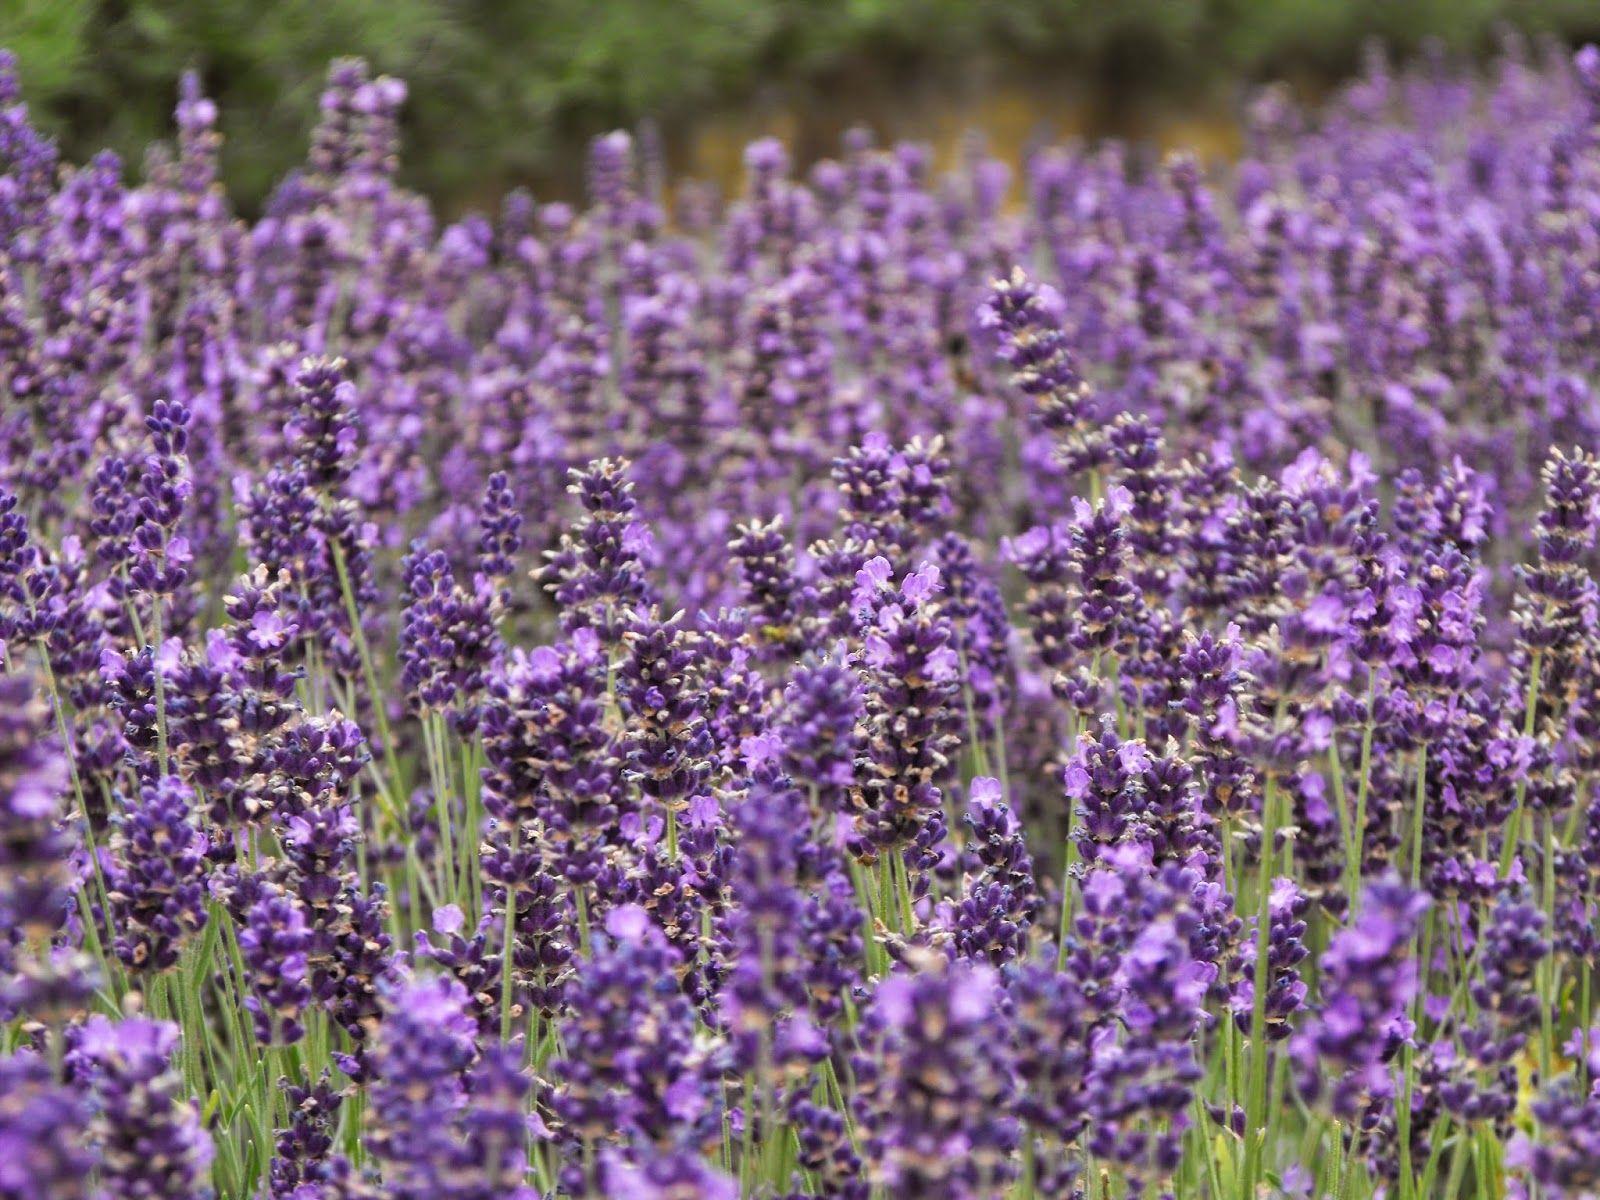 [something creative here]: Lovely Lavender